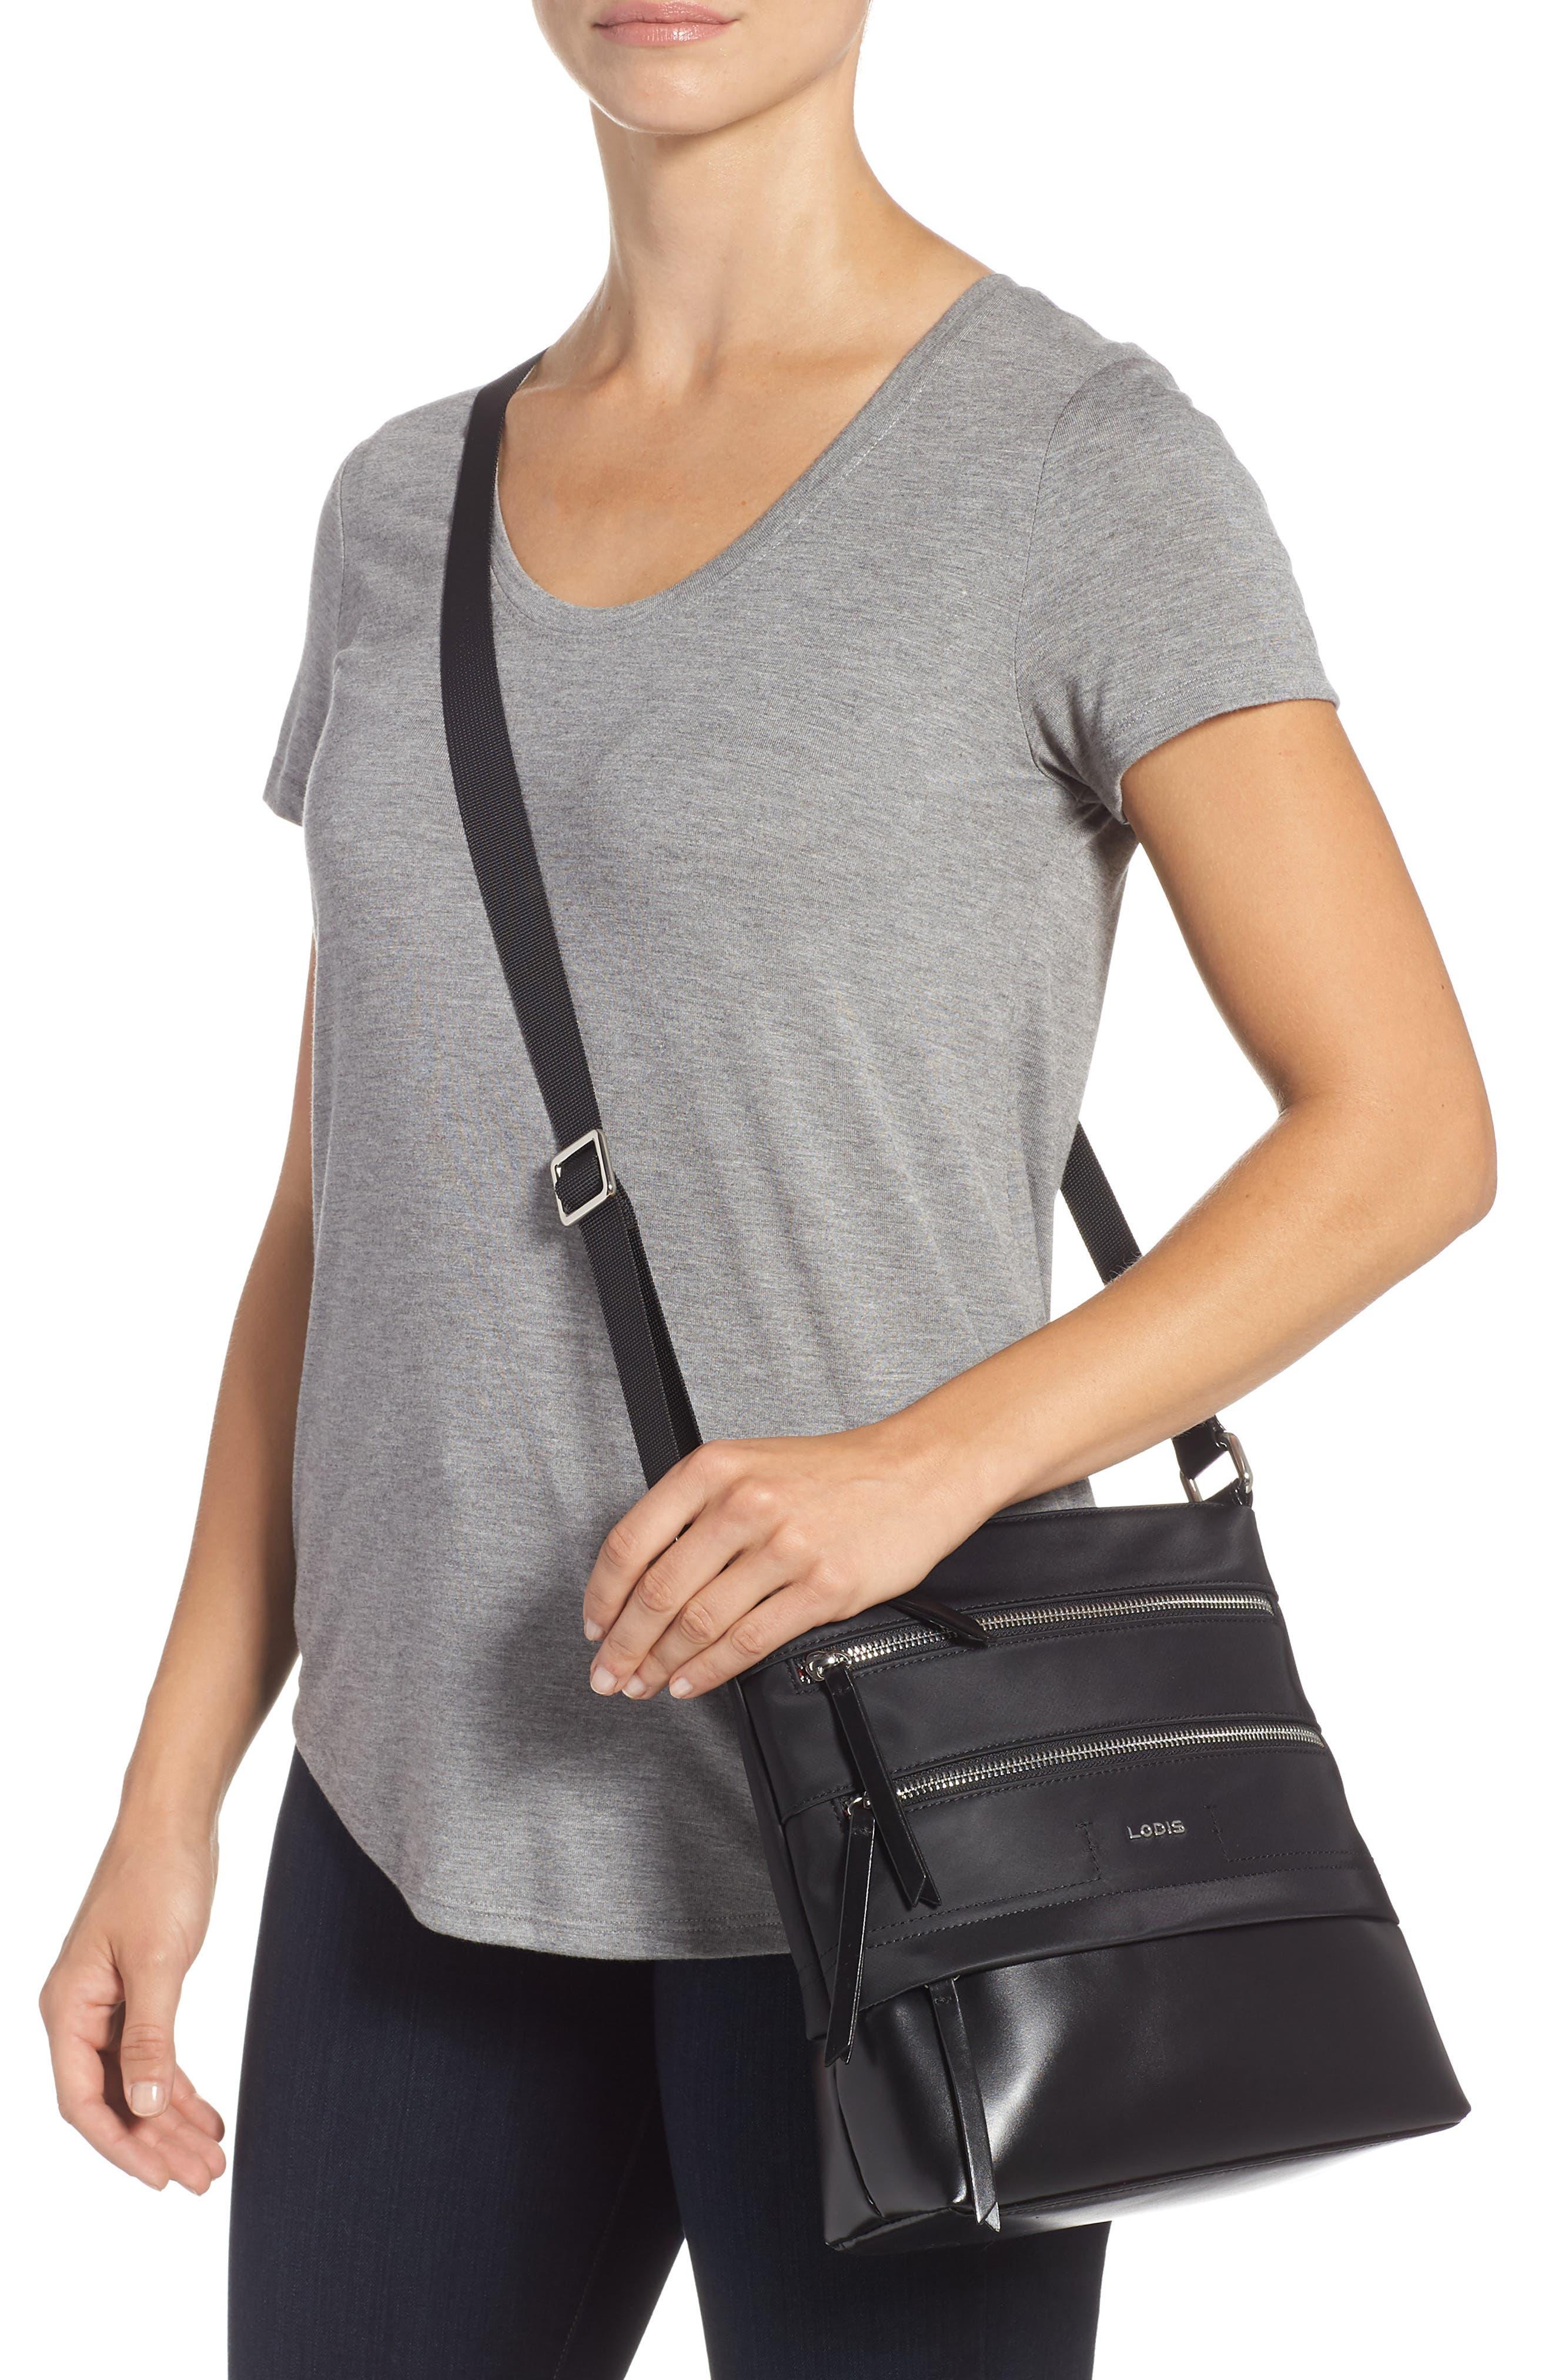 Wanda Nylon Sport RFID Travel Crossbody Bag,                             Alternate thumbnail 2, color,                             001